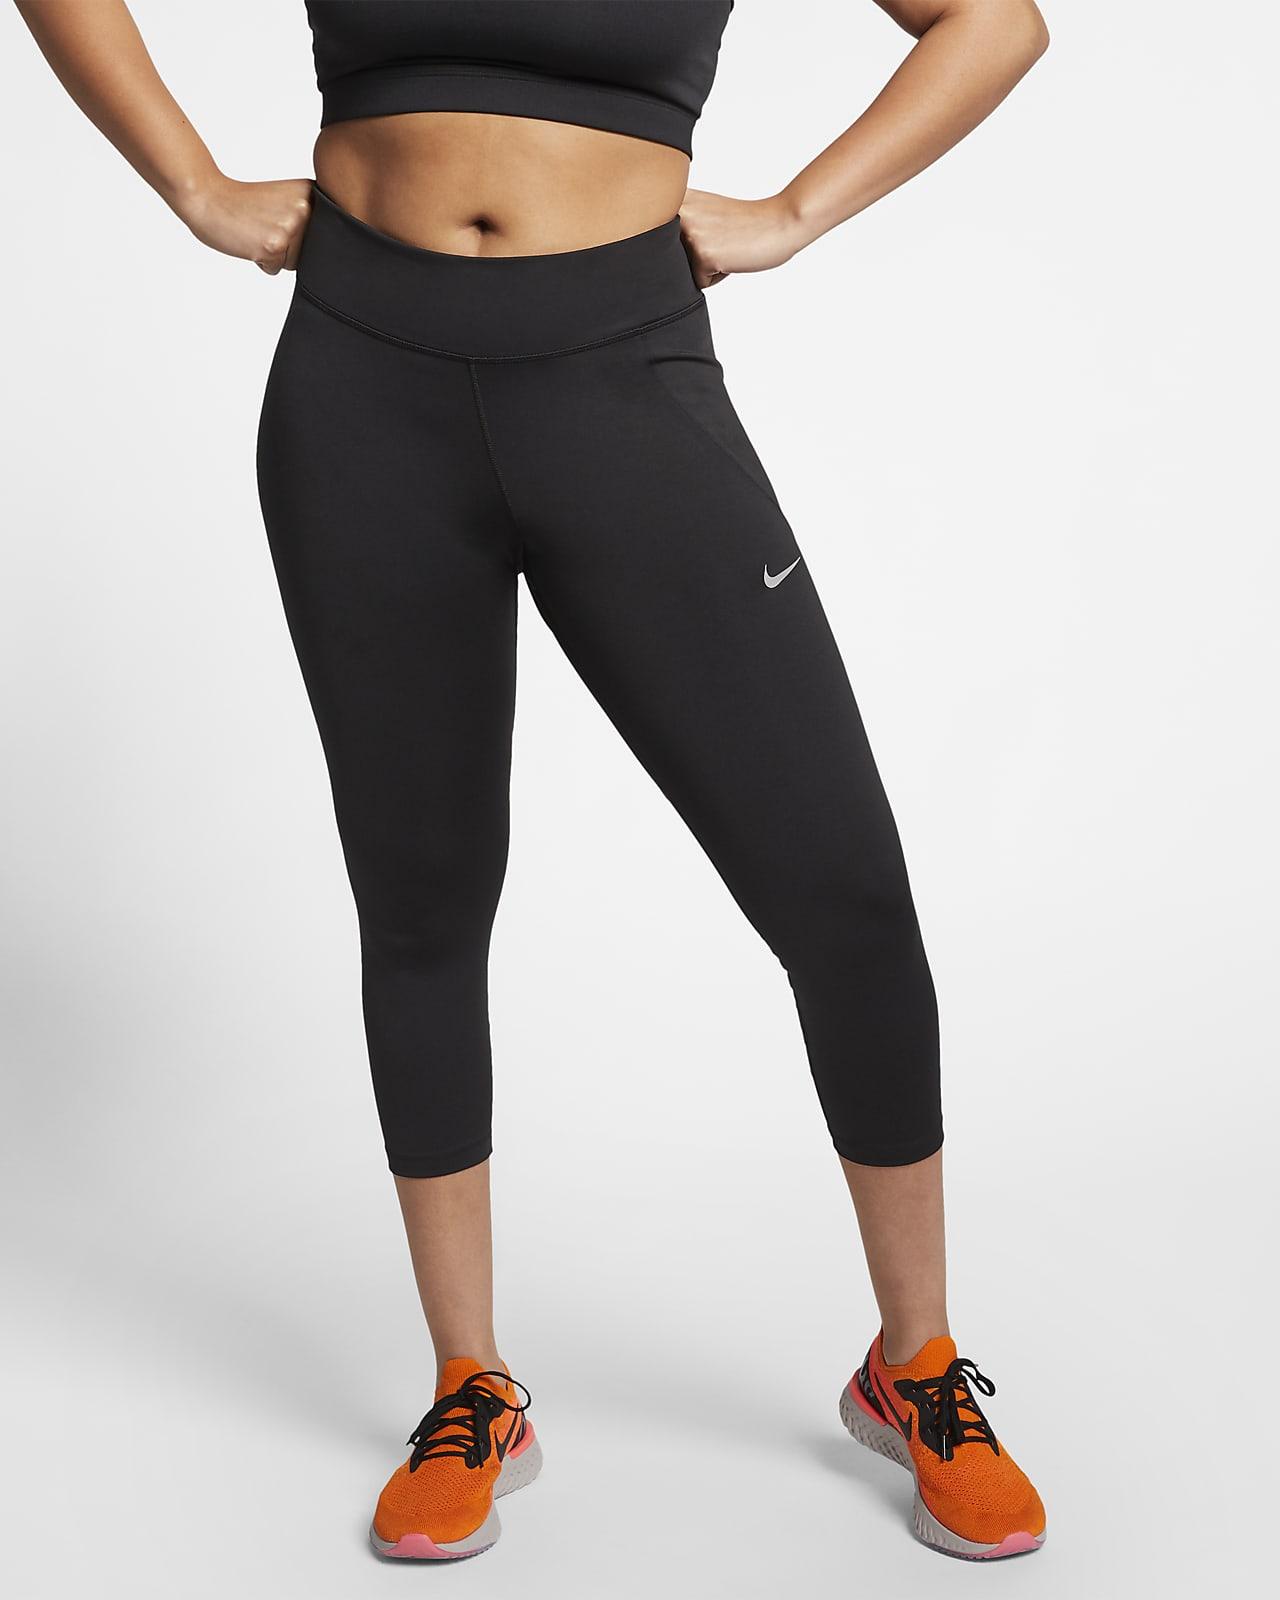 Korte Nike Fast-løbeleggings til kvinder (plus size)